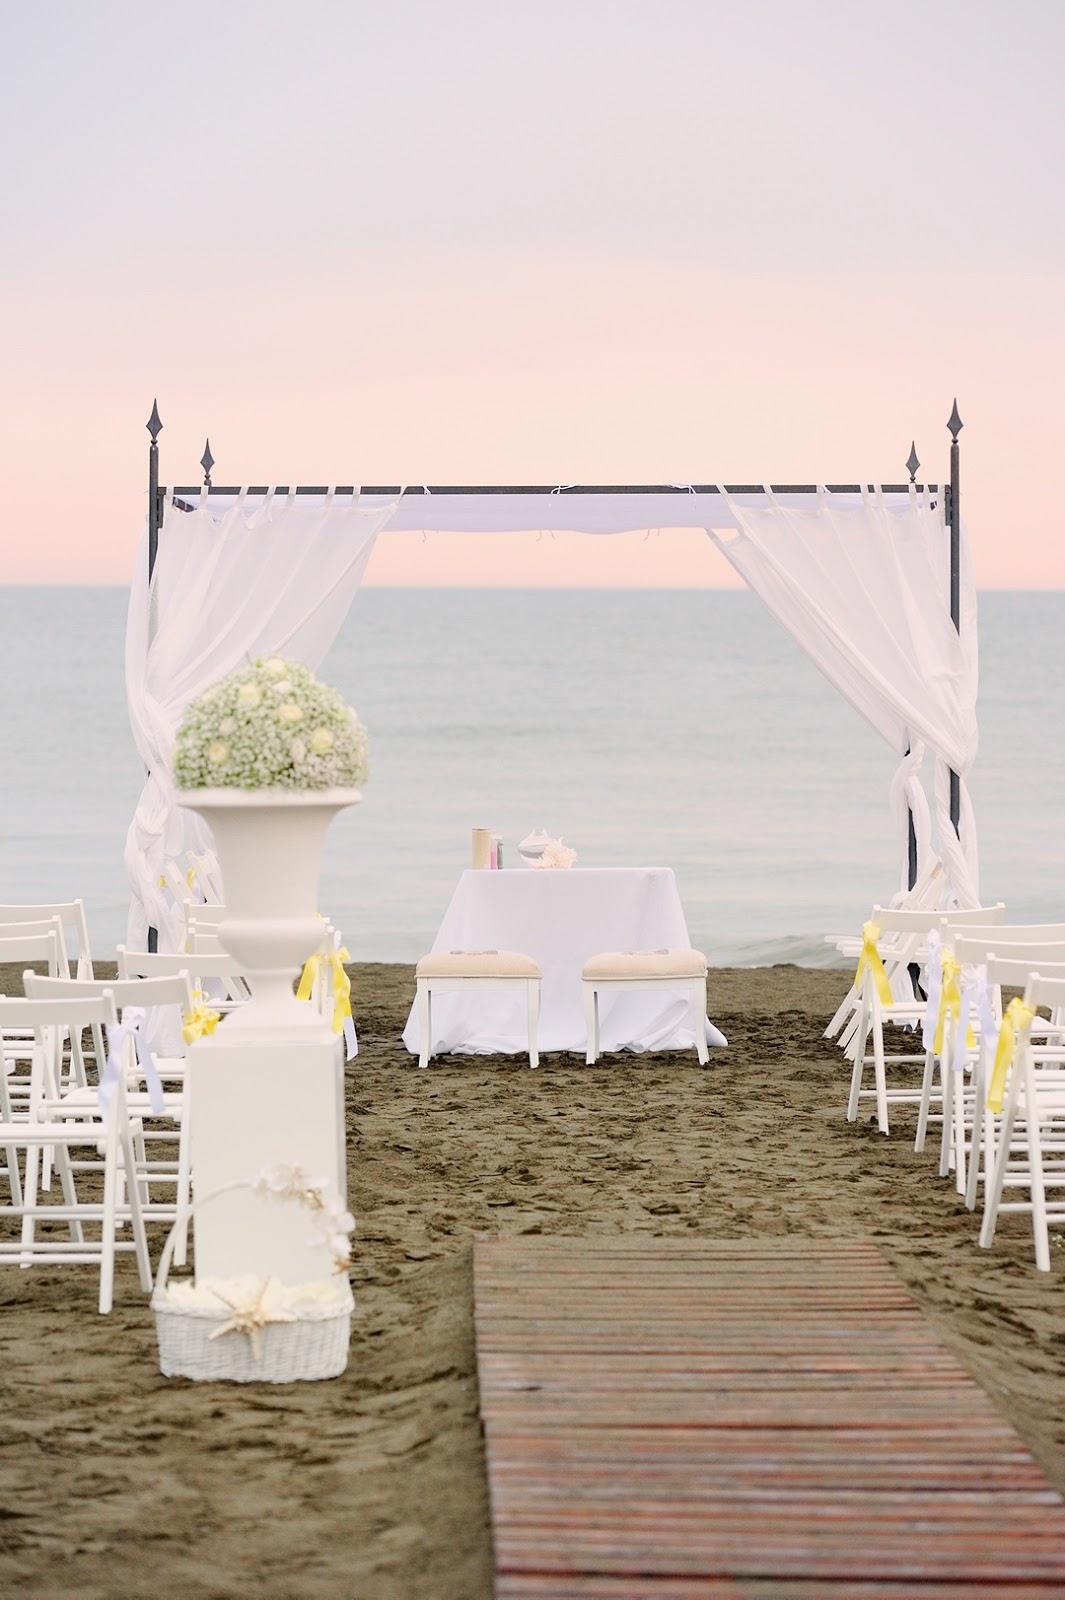 Matrimonio Spiaggia Tenerife : Matrimonio in spiaggia sotto l